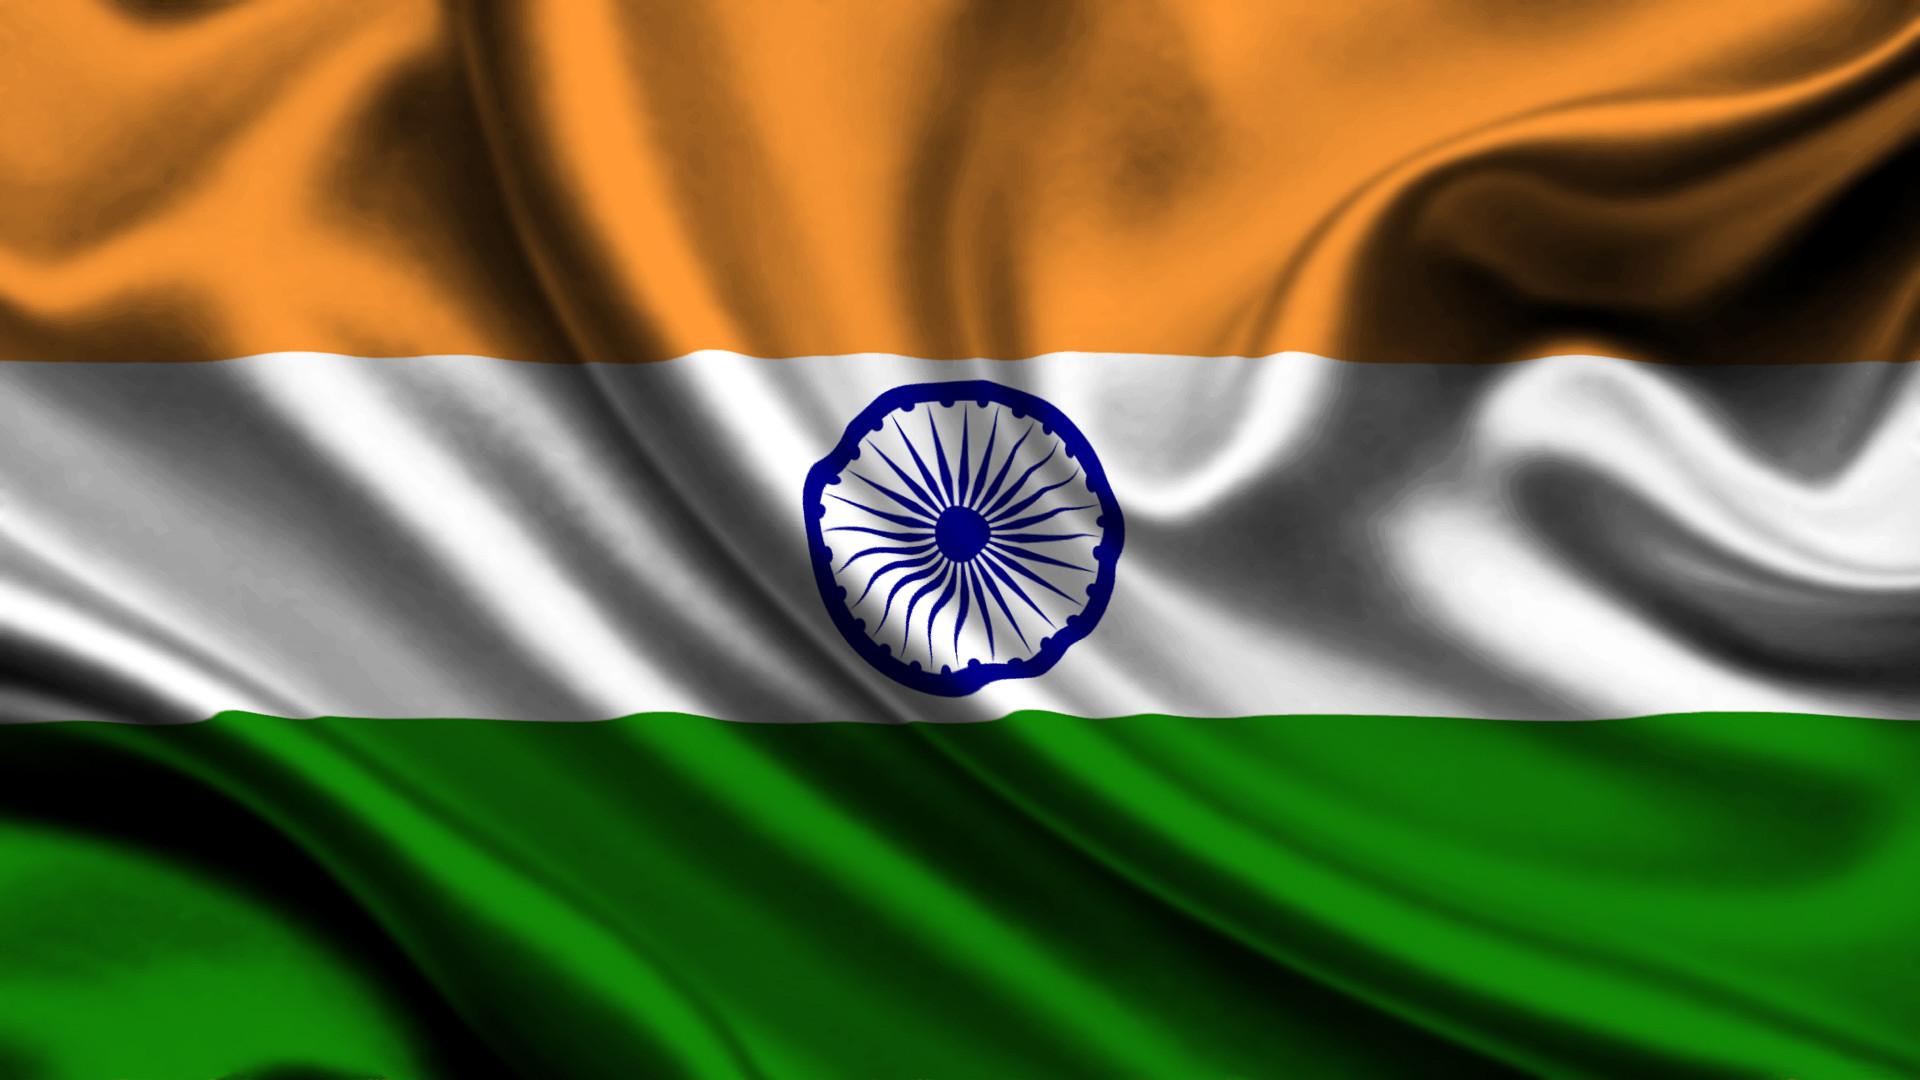 hd wallpaper of india